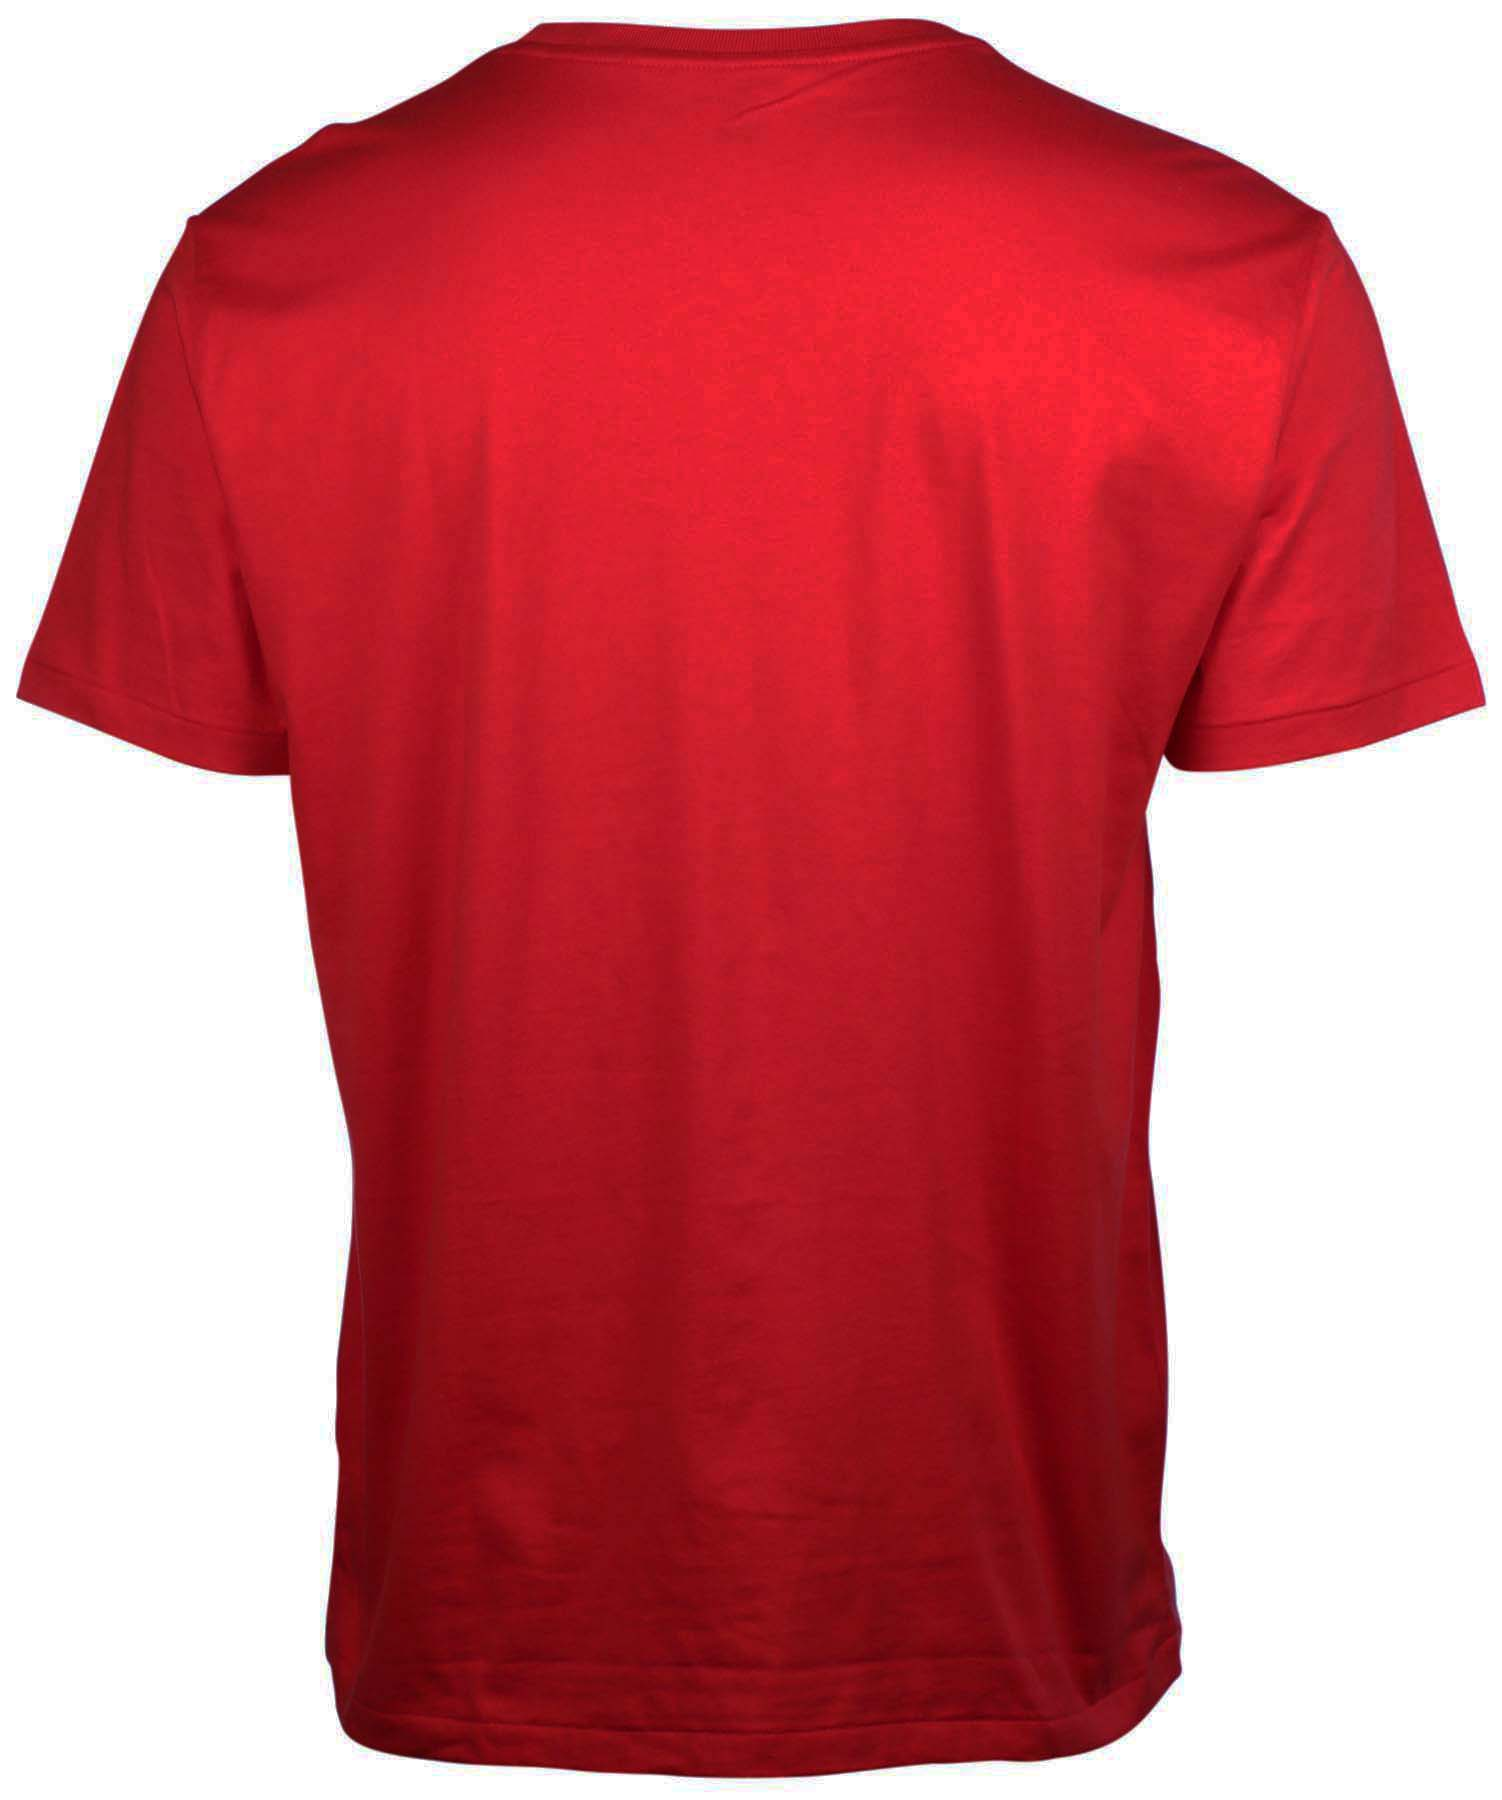 Polo Ralph Lauren Men 39 S Pony Classic Fit T Shirt Ebay